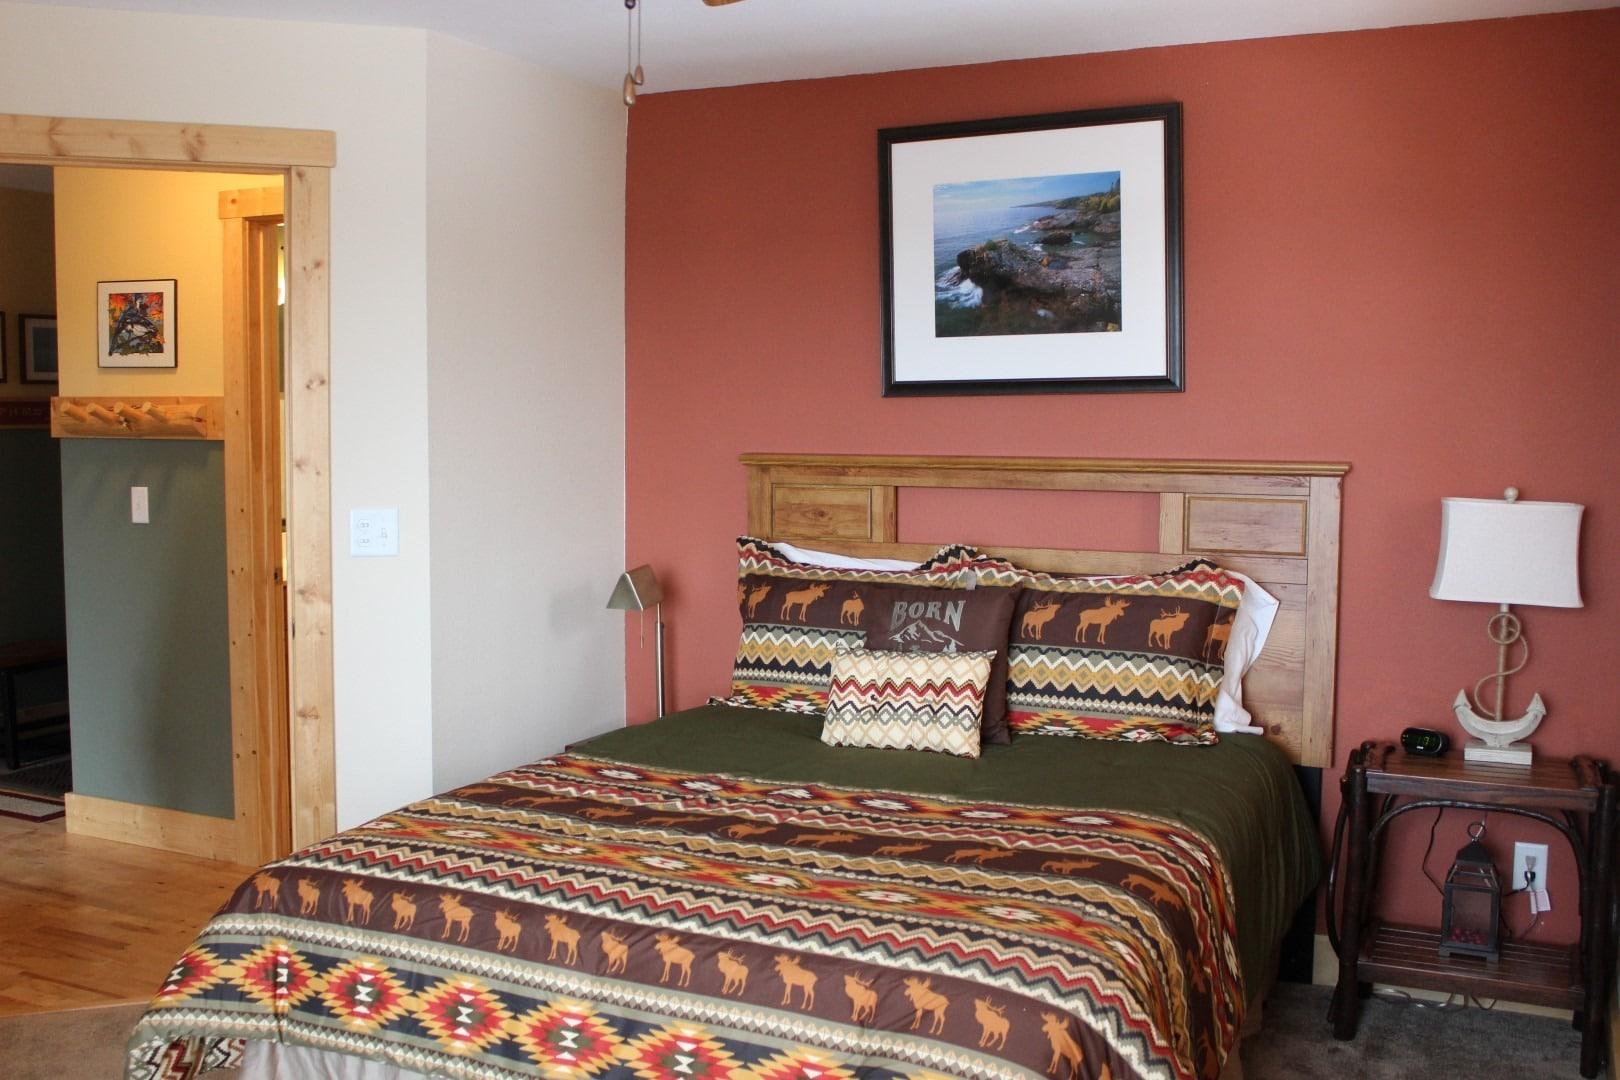 524 Bedroom 2 Qn